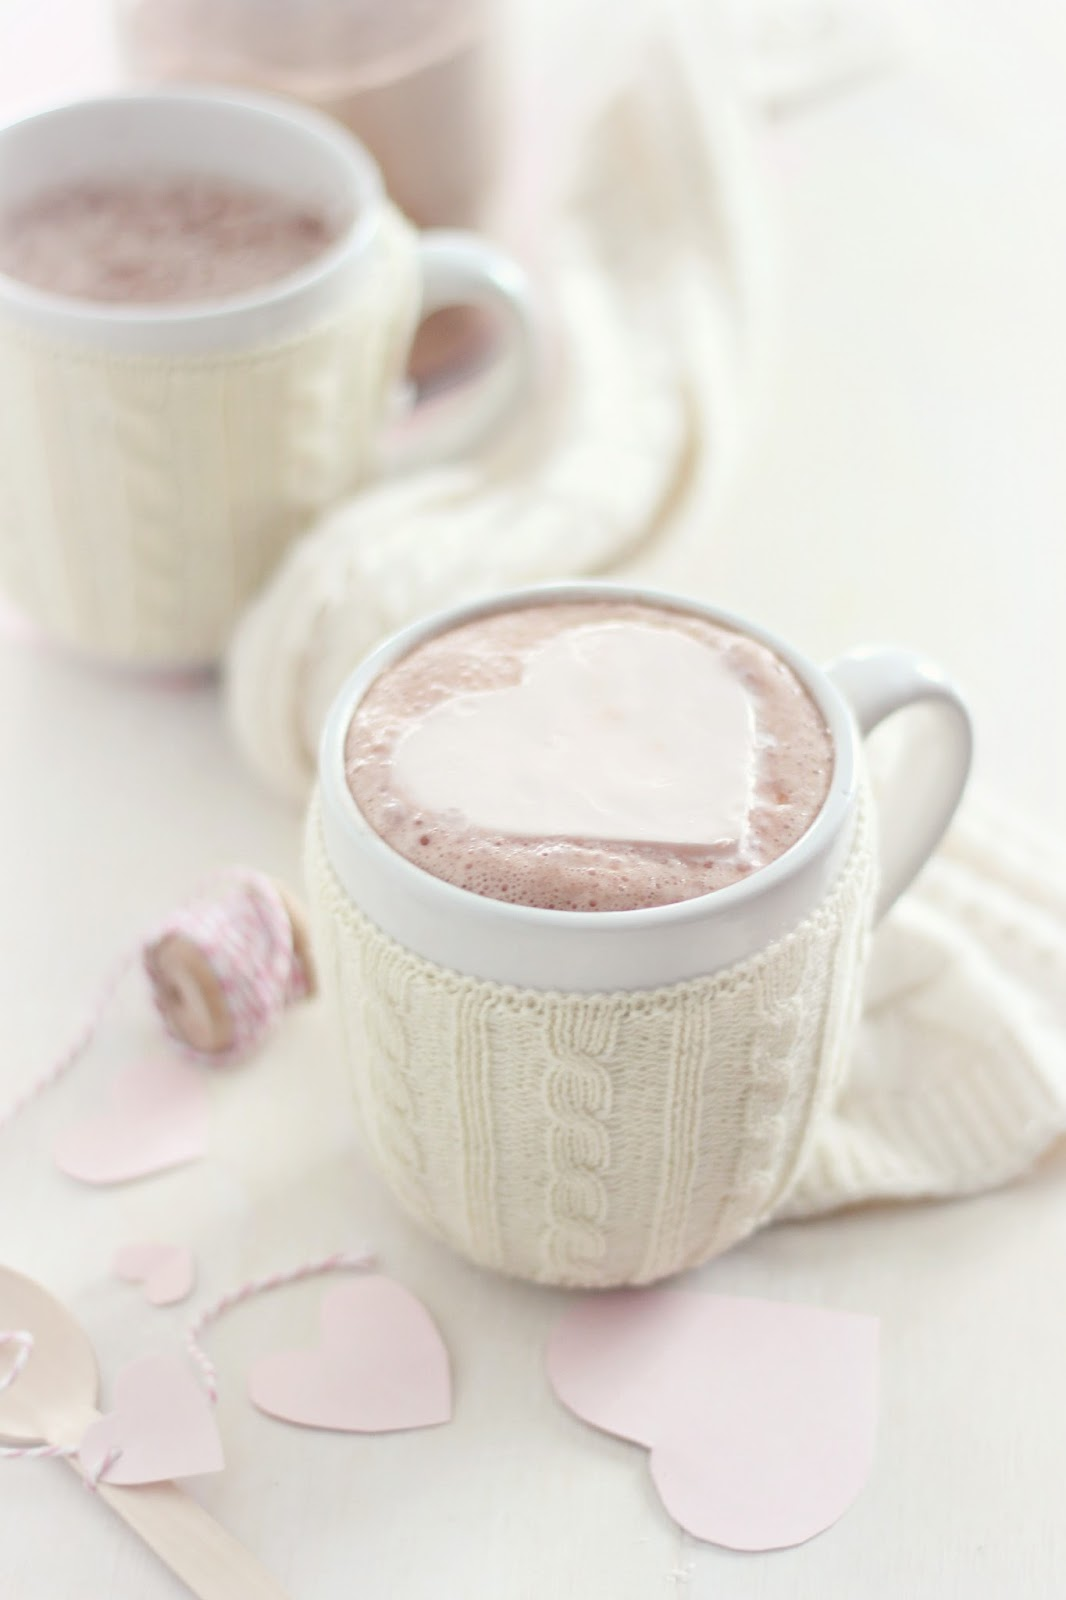 Valentines Roundup - Whipped Cream Heart